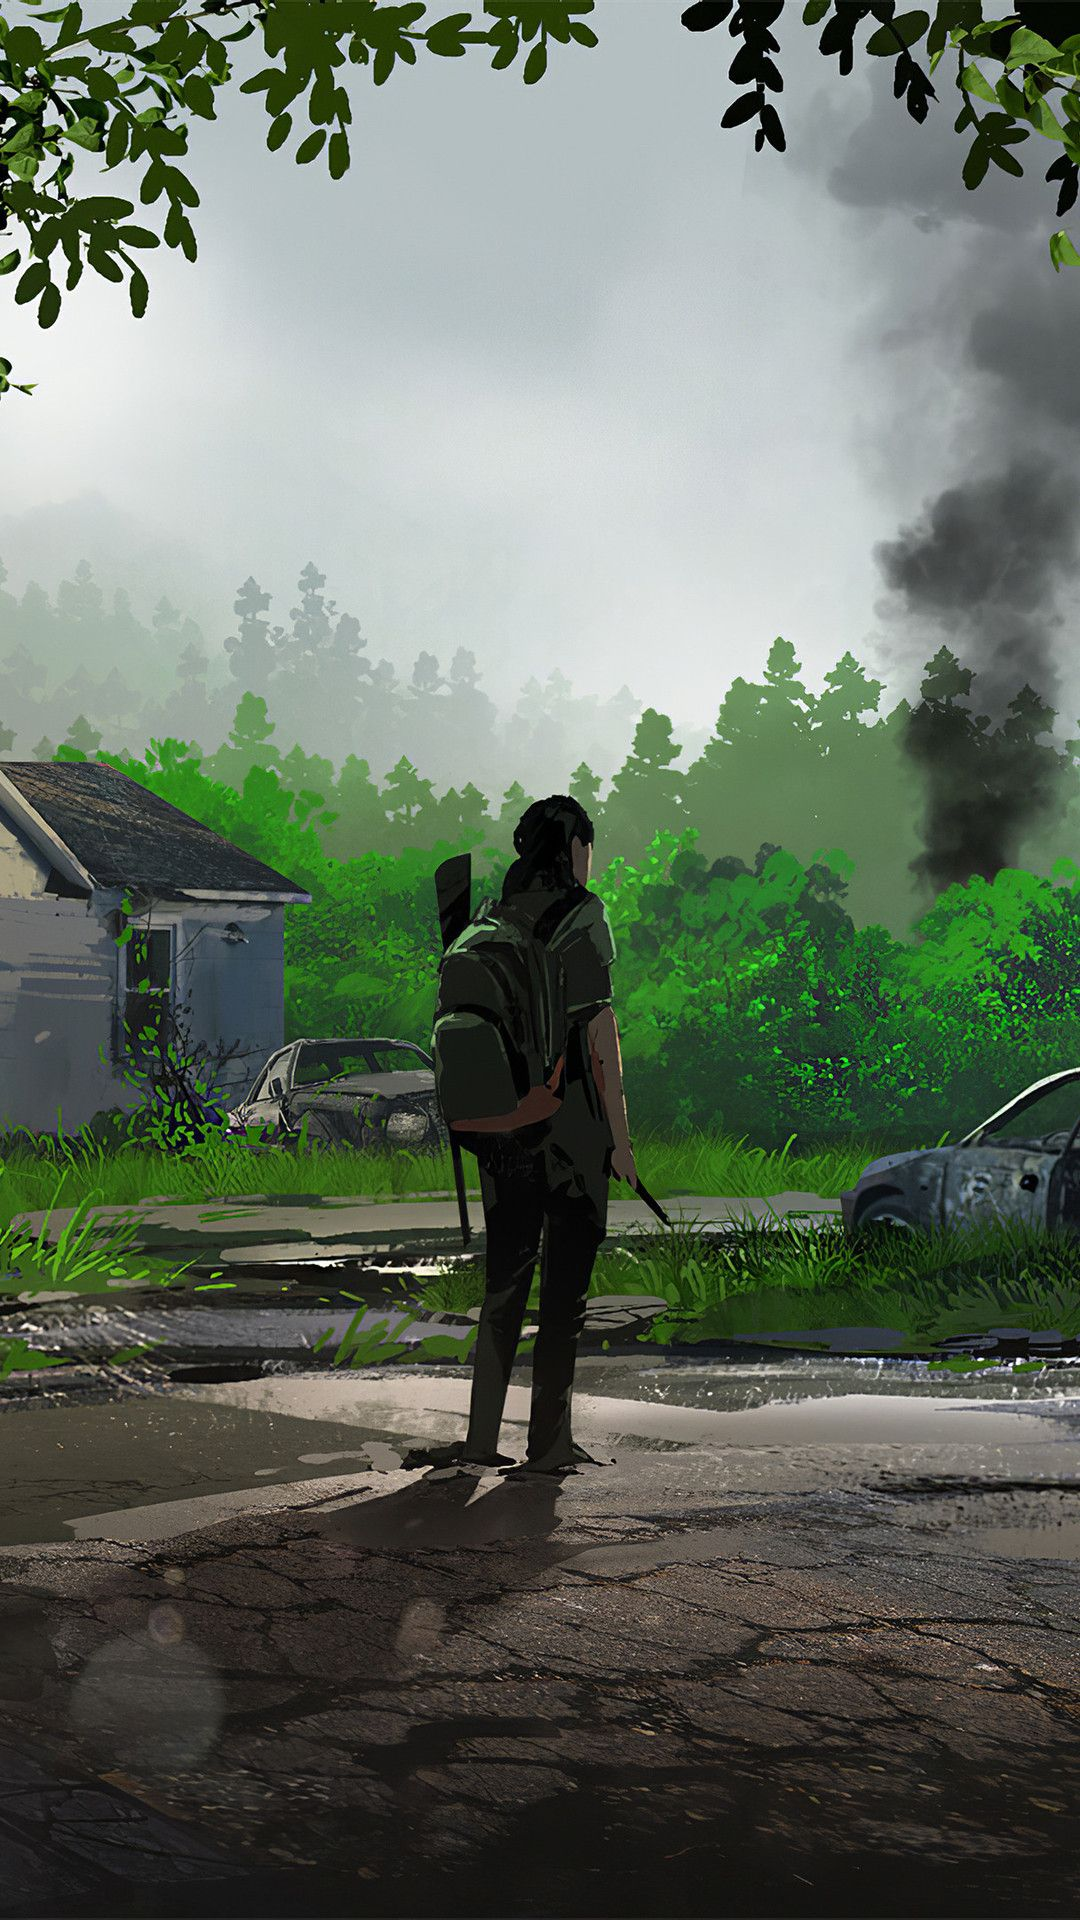 The Last Of Us Part Ii Fan Art Mobile Wallpaper Iphone Android Samsung Pixel Xiaomi Em 2020 Papeis De Parede De Jogos Imagens Aleatorias Arte De Jogos